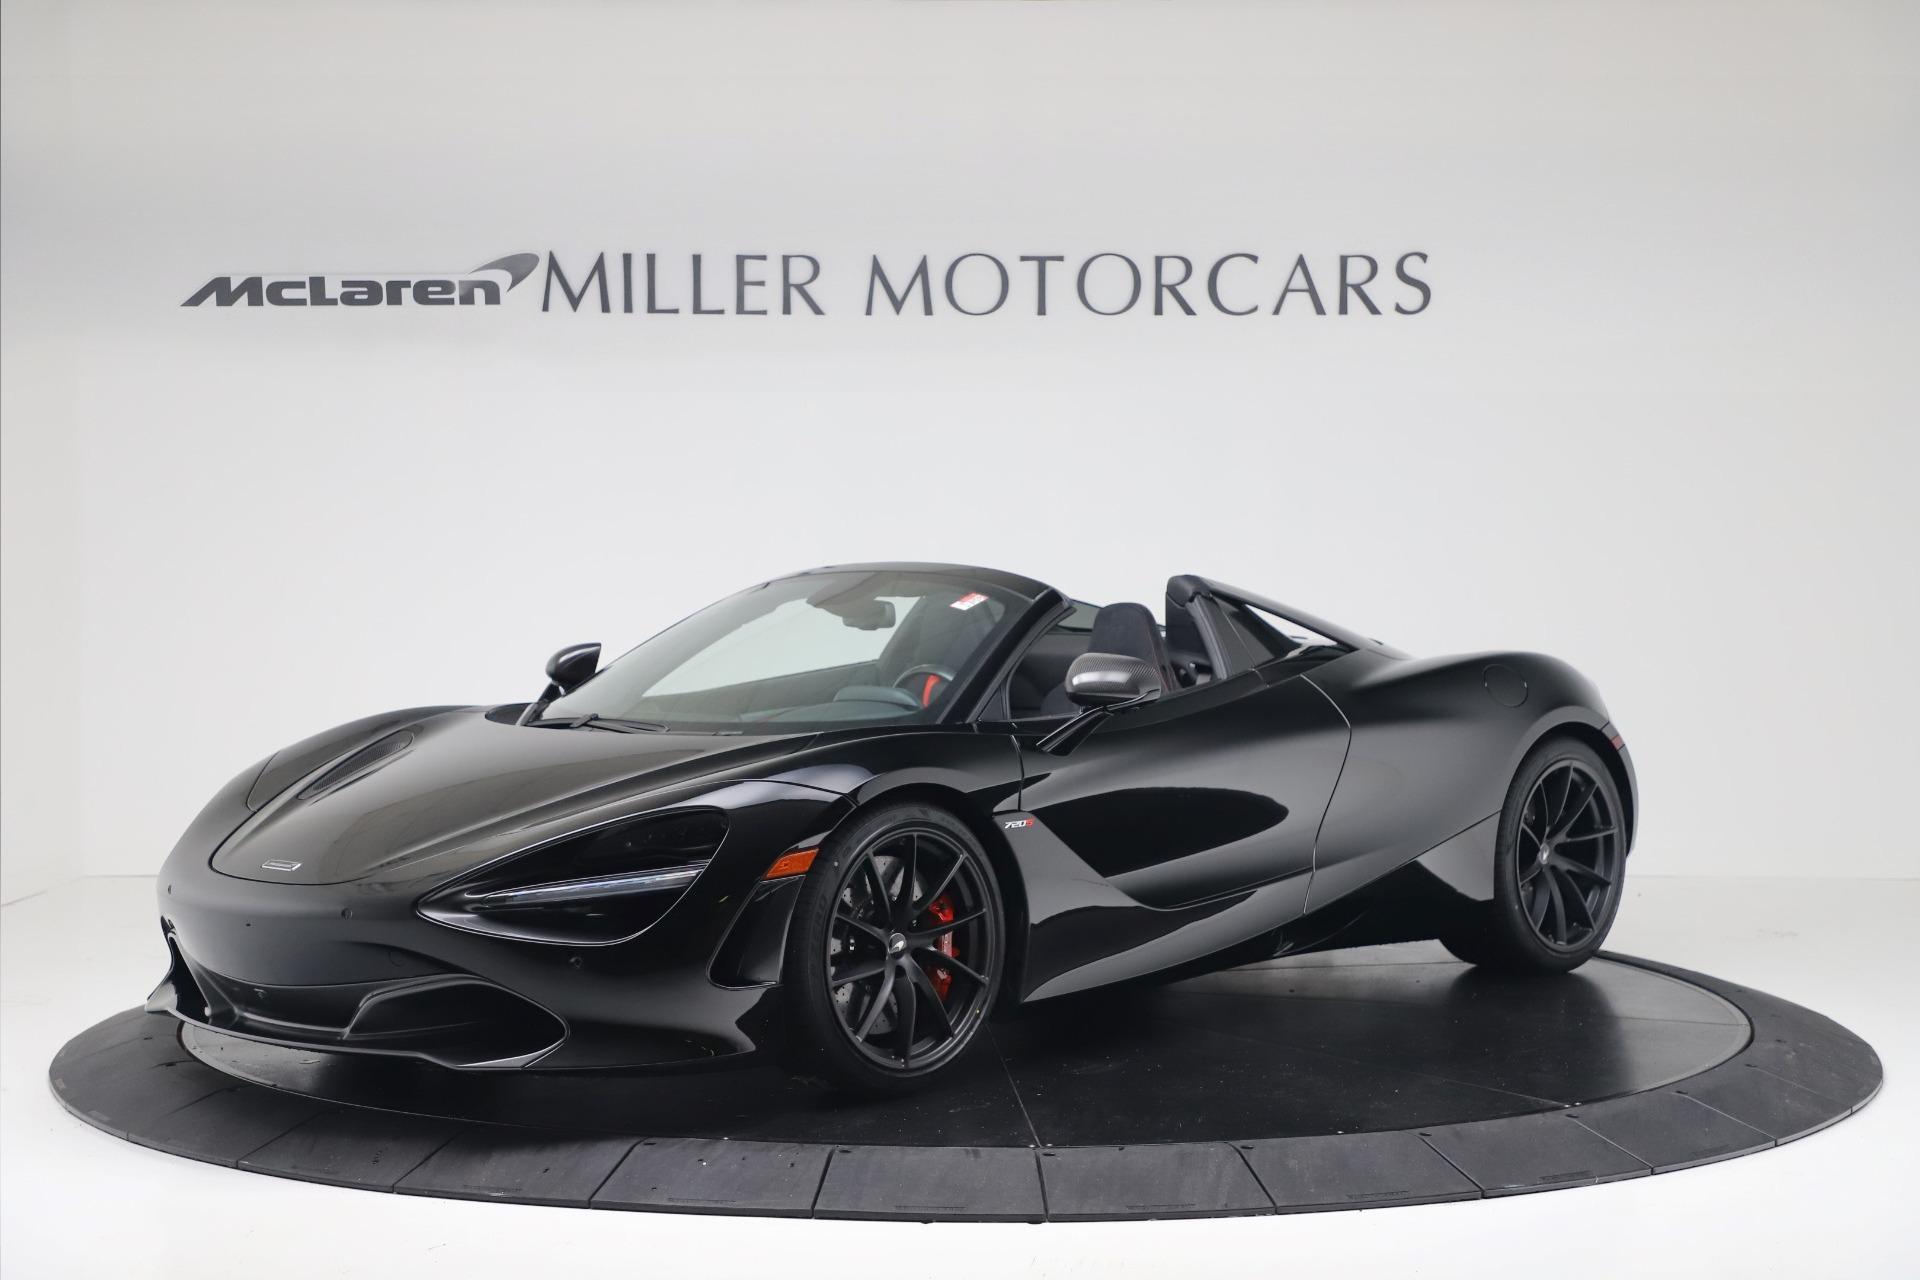 New 2020 McLaren 720S Spider Convertible for sale $383,090 at McLaren Greenwich in Greenwich CT 06830 1